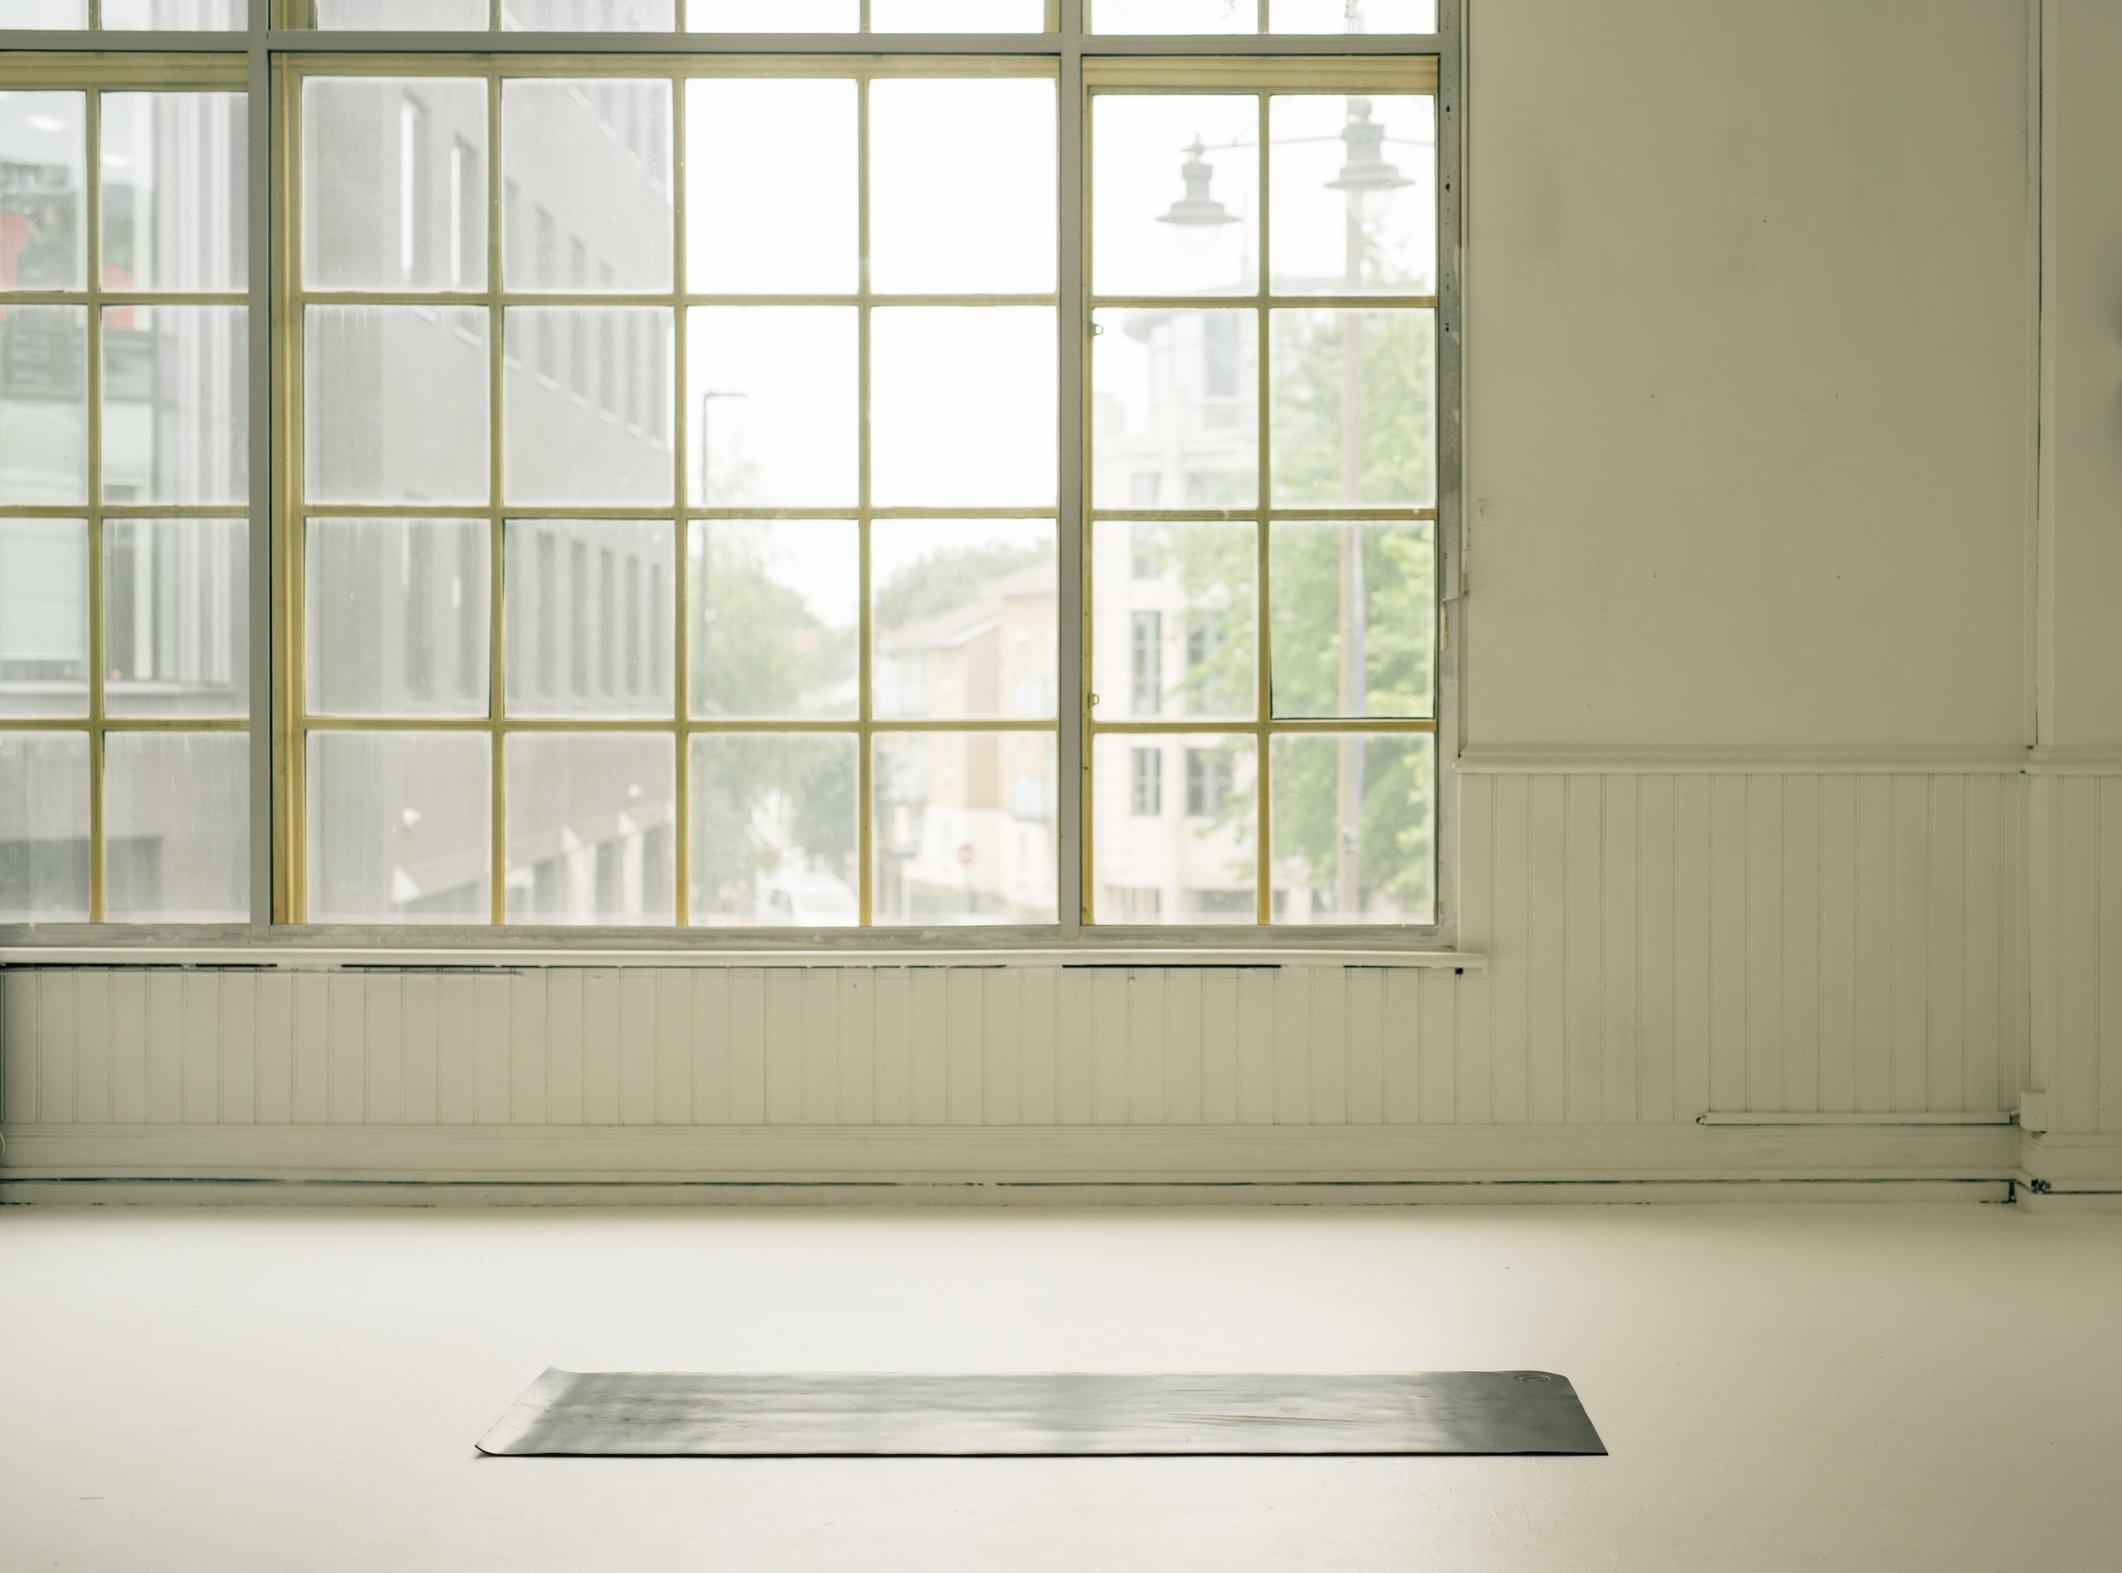 Renee-Yoga-July2019-JenniferMcCord-Edits.jpg